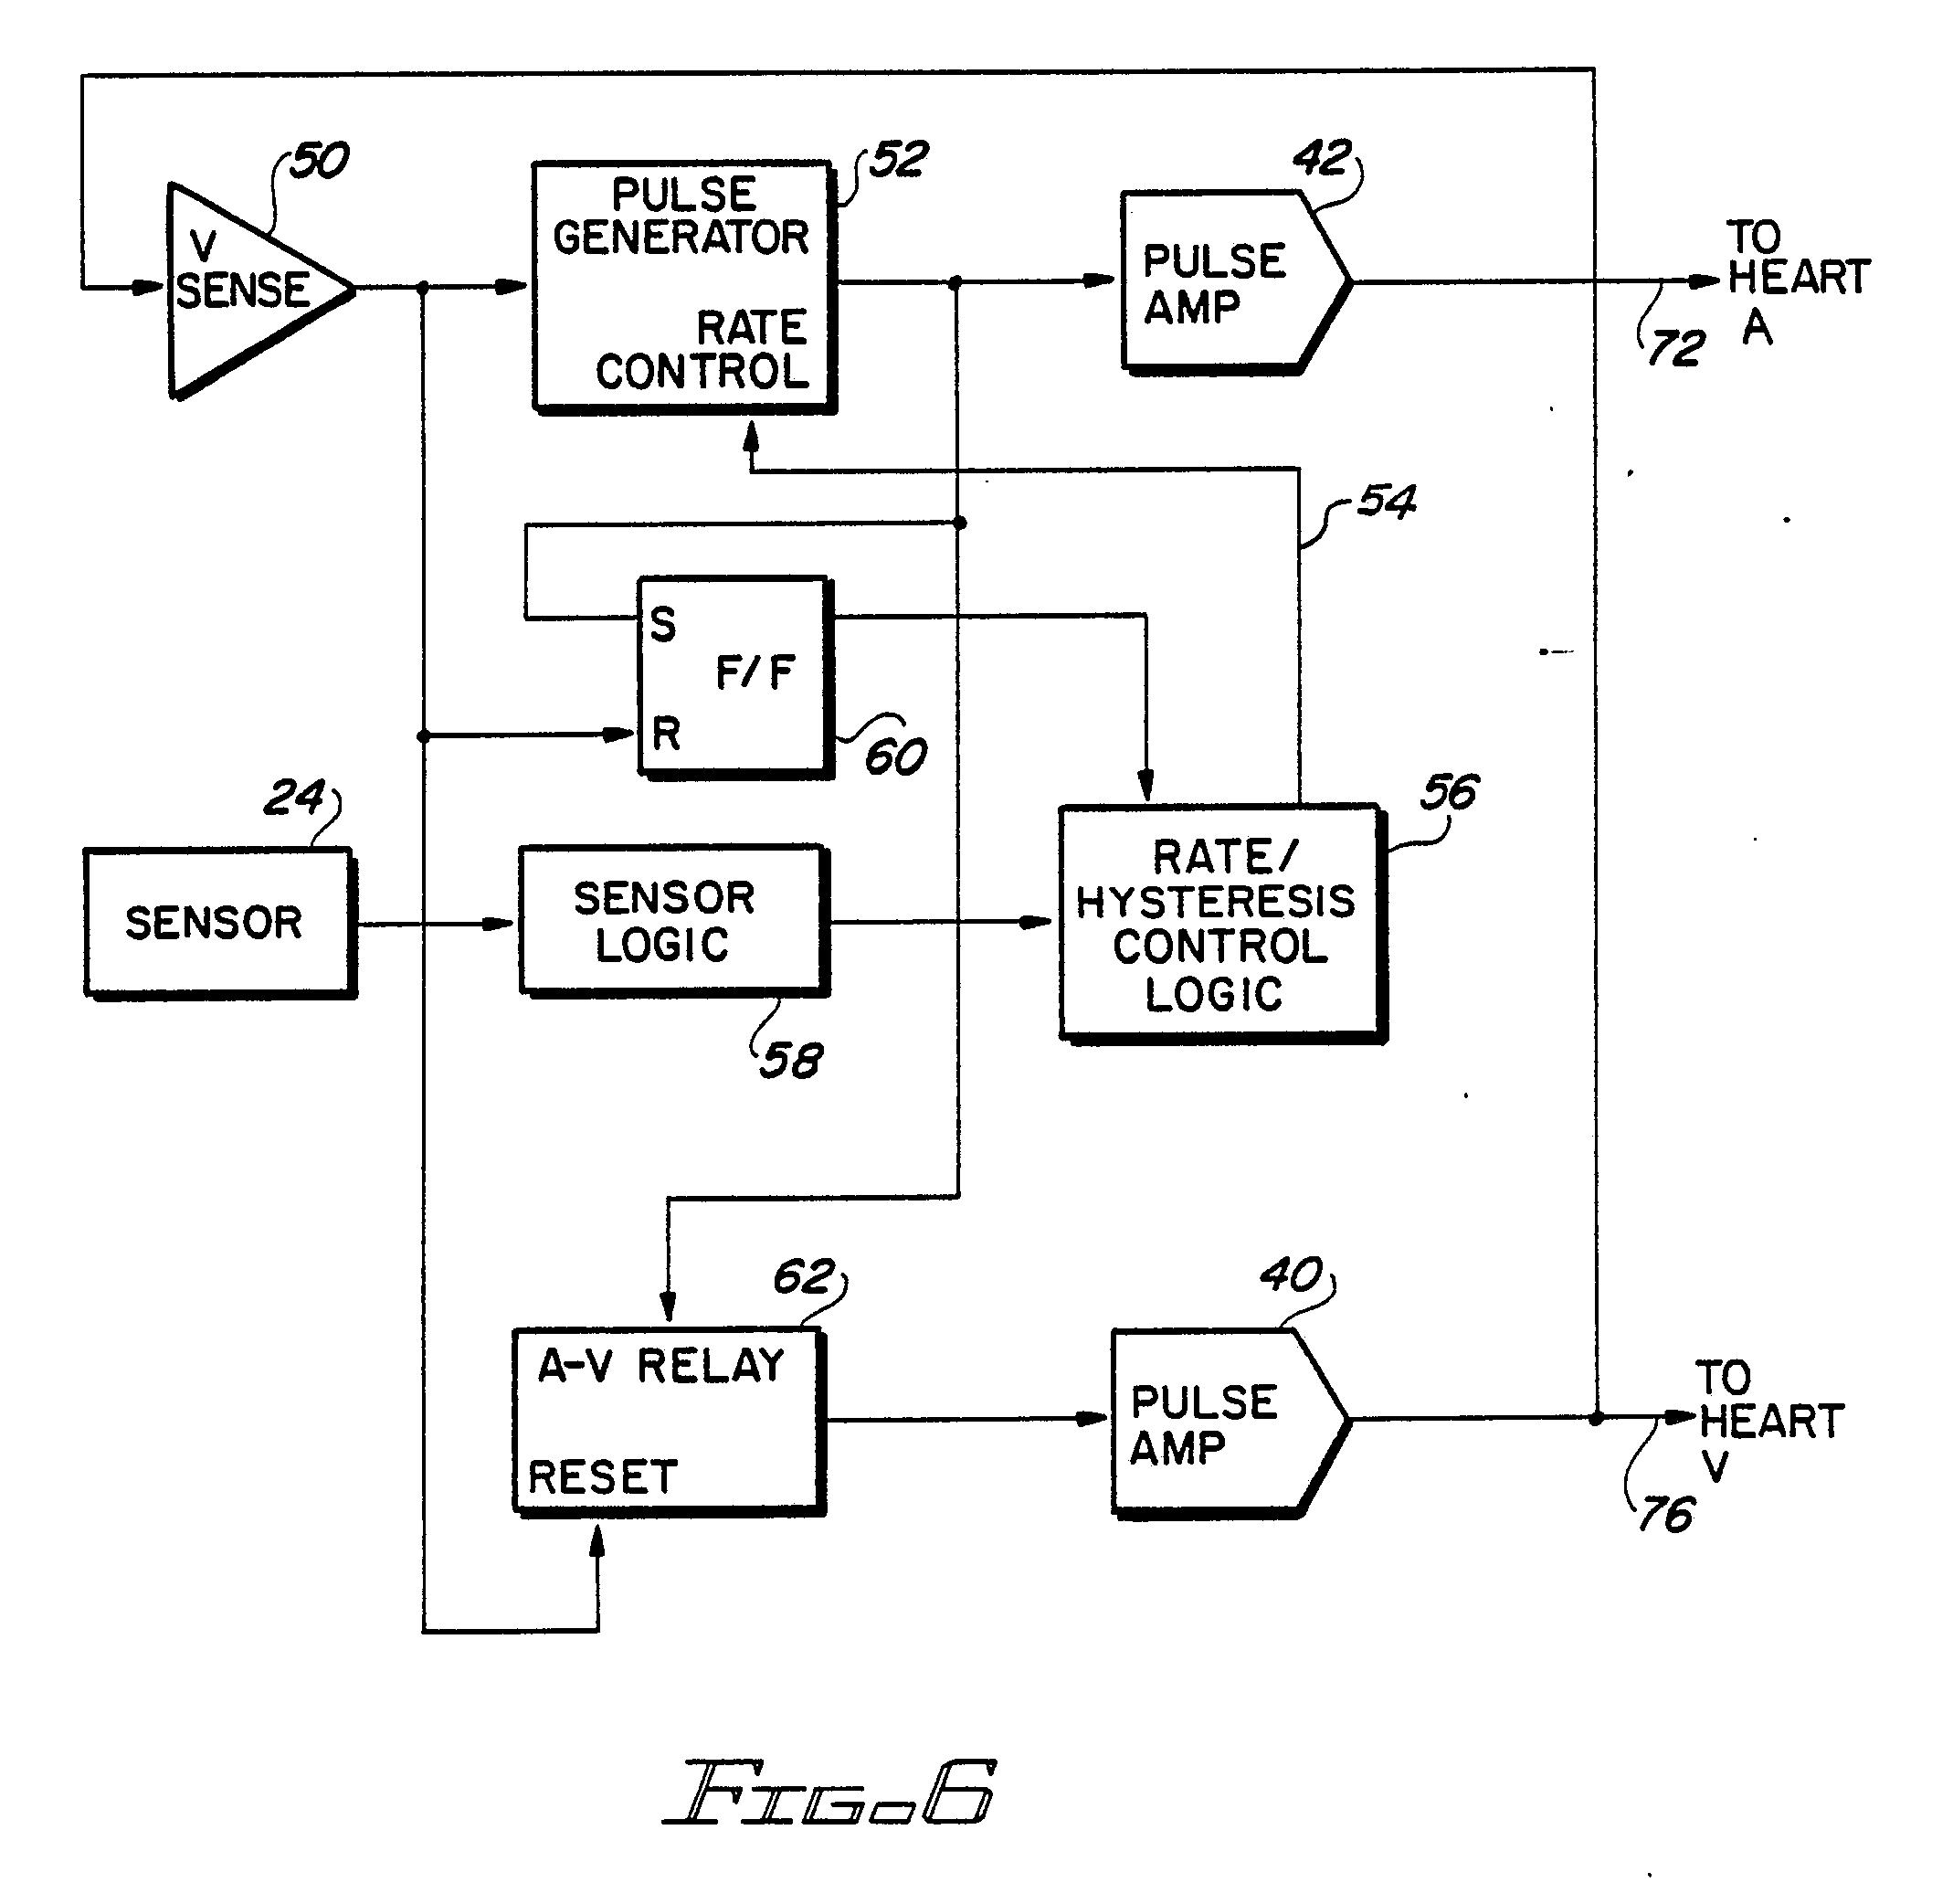 imgf0005 pacemaker block diagram blueraritan info